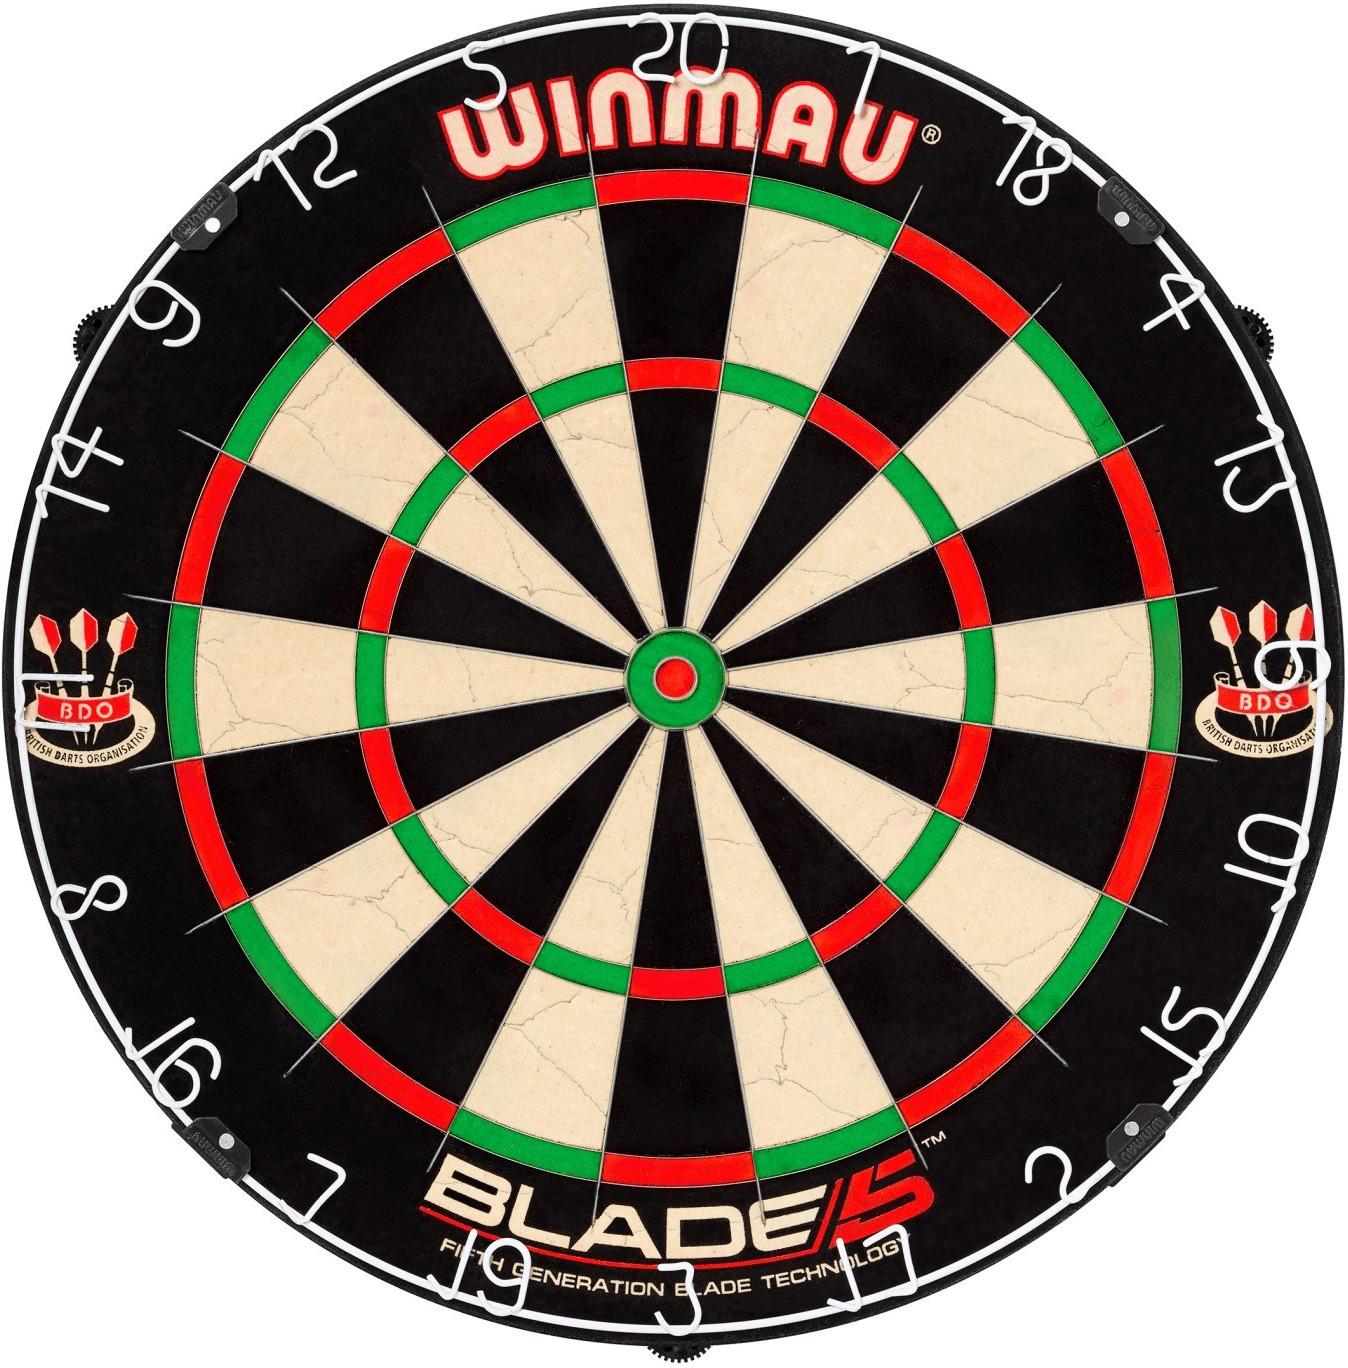 Winmau Dartboard Original Blade 5